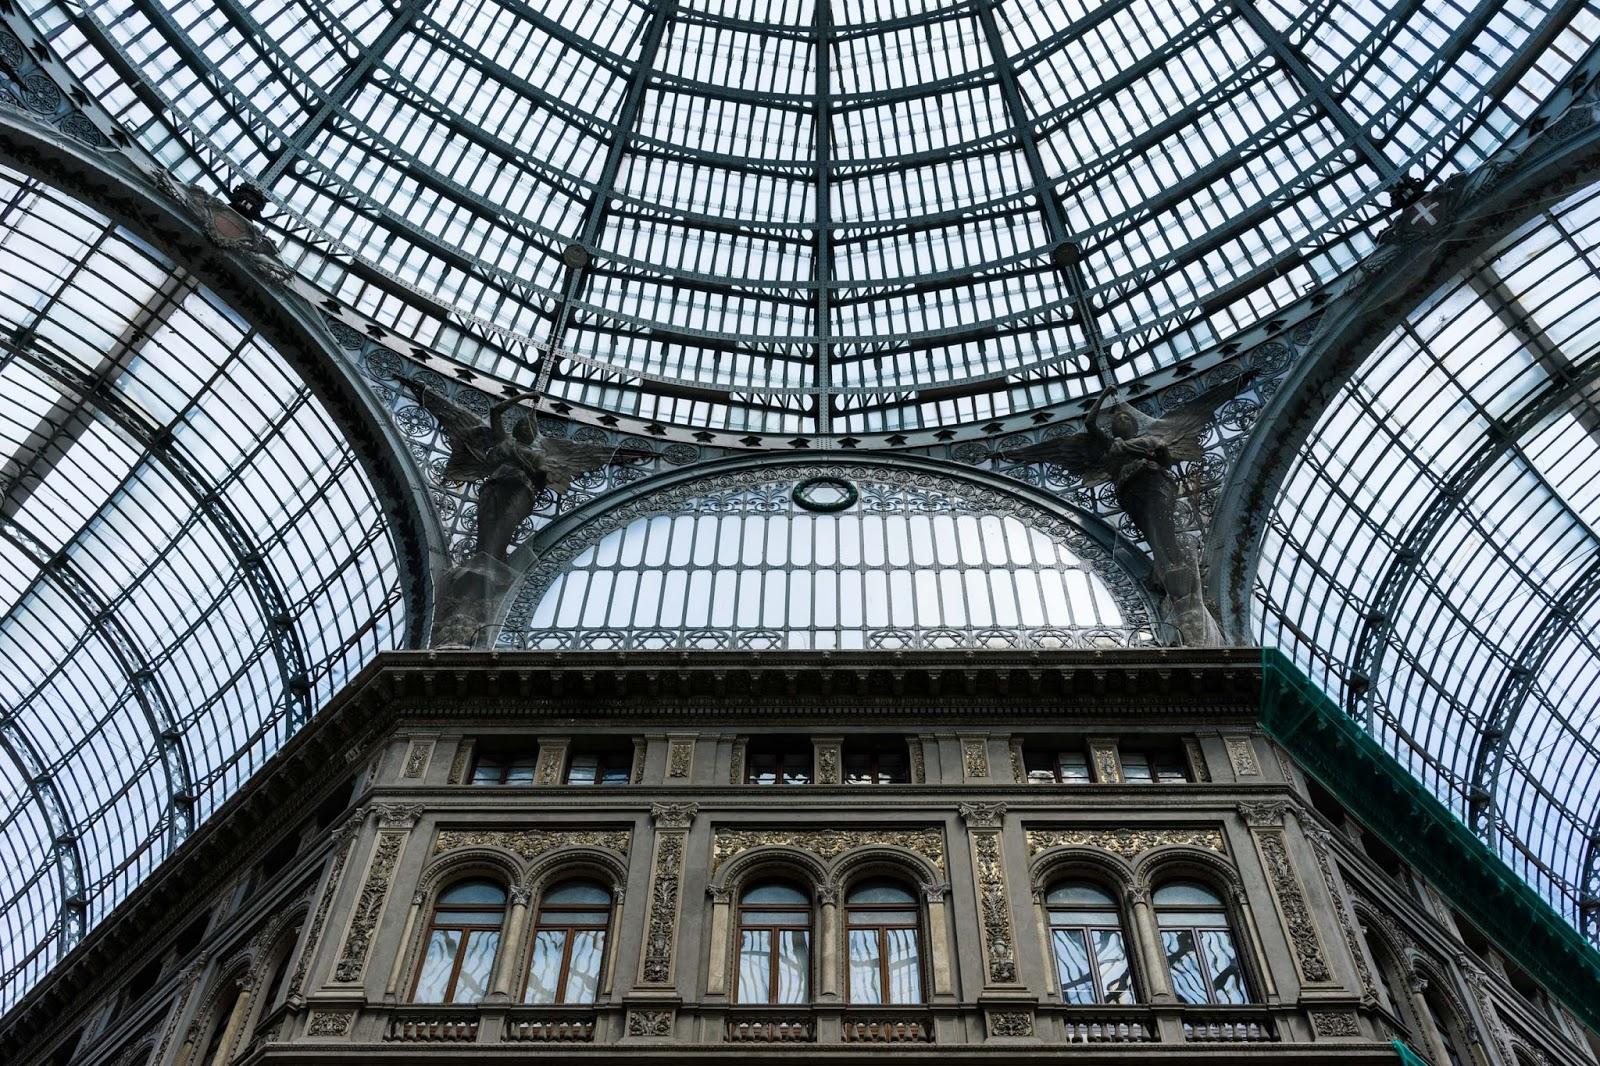 Galería Umberto I